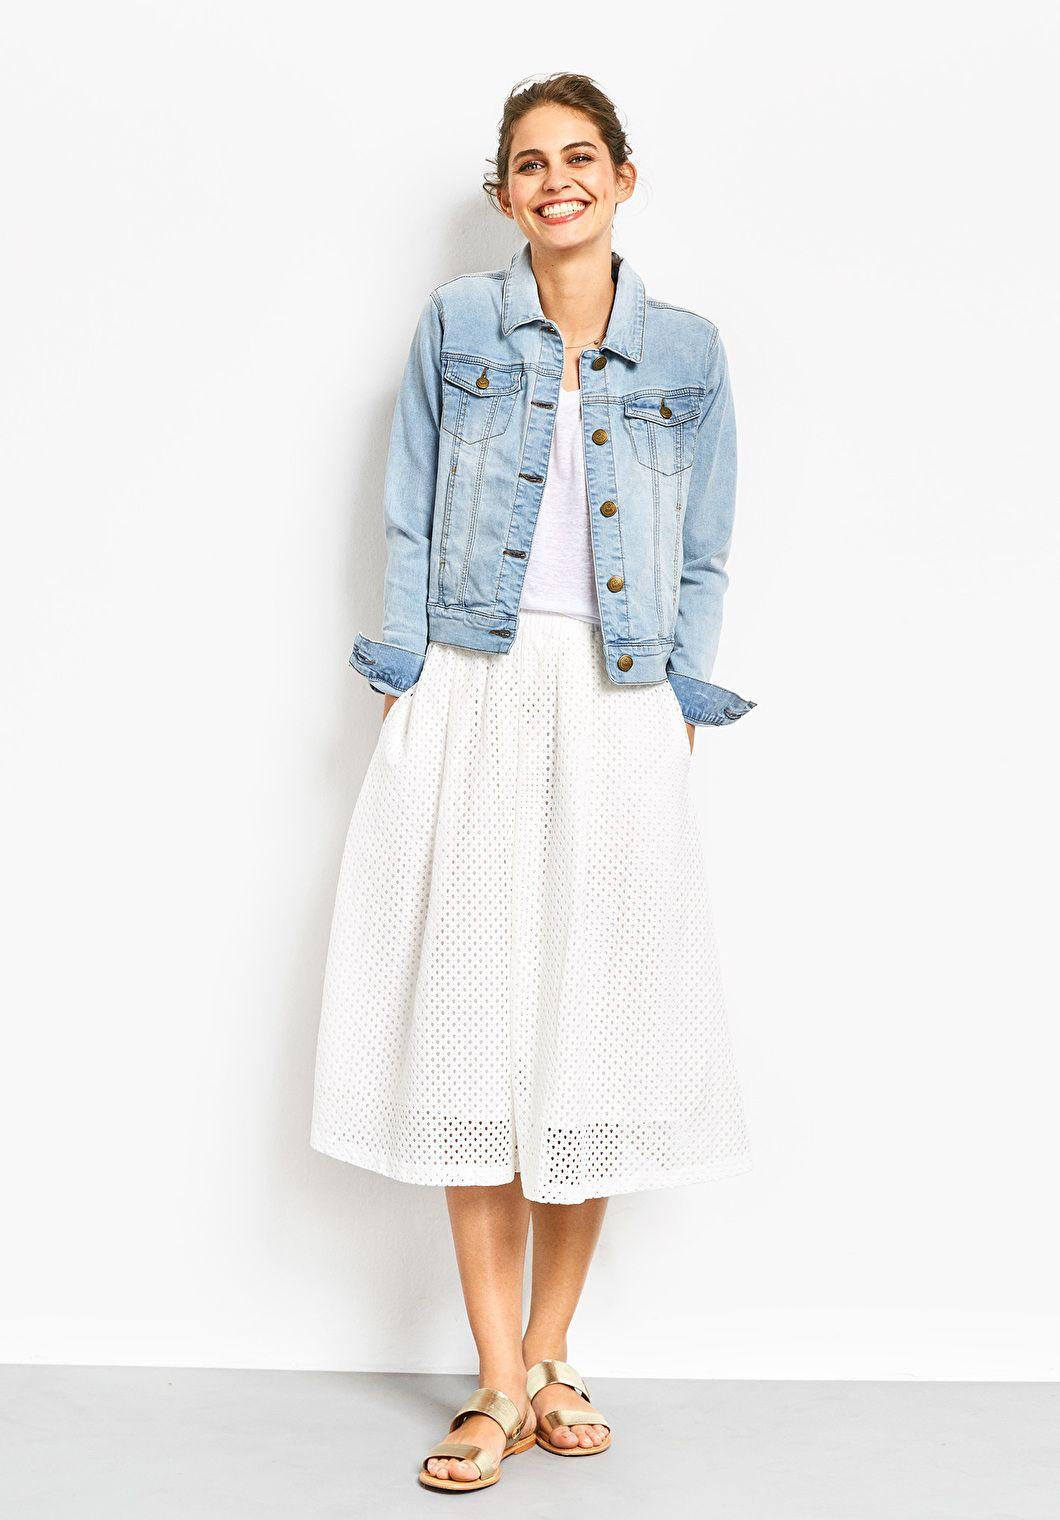 c82e3610dc Denim Jacket   Fashion   Denim jacket with dress, Denim skirt ...